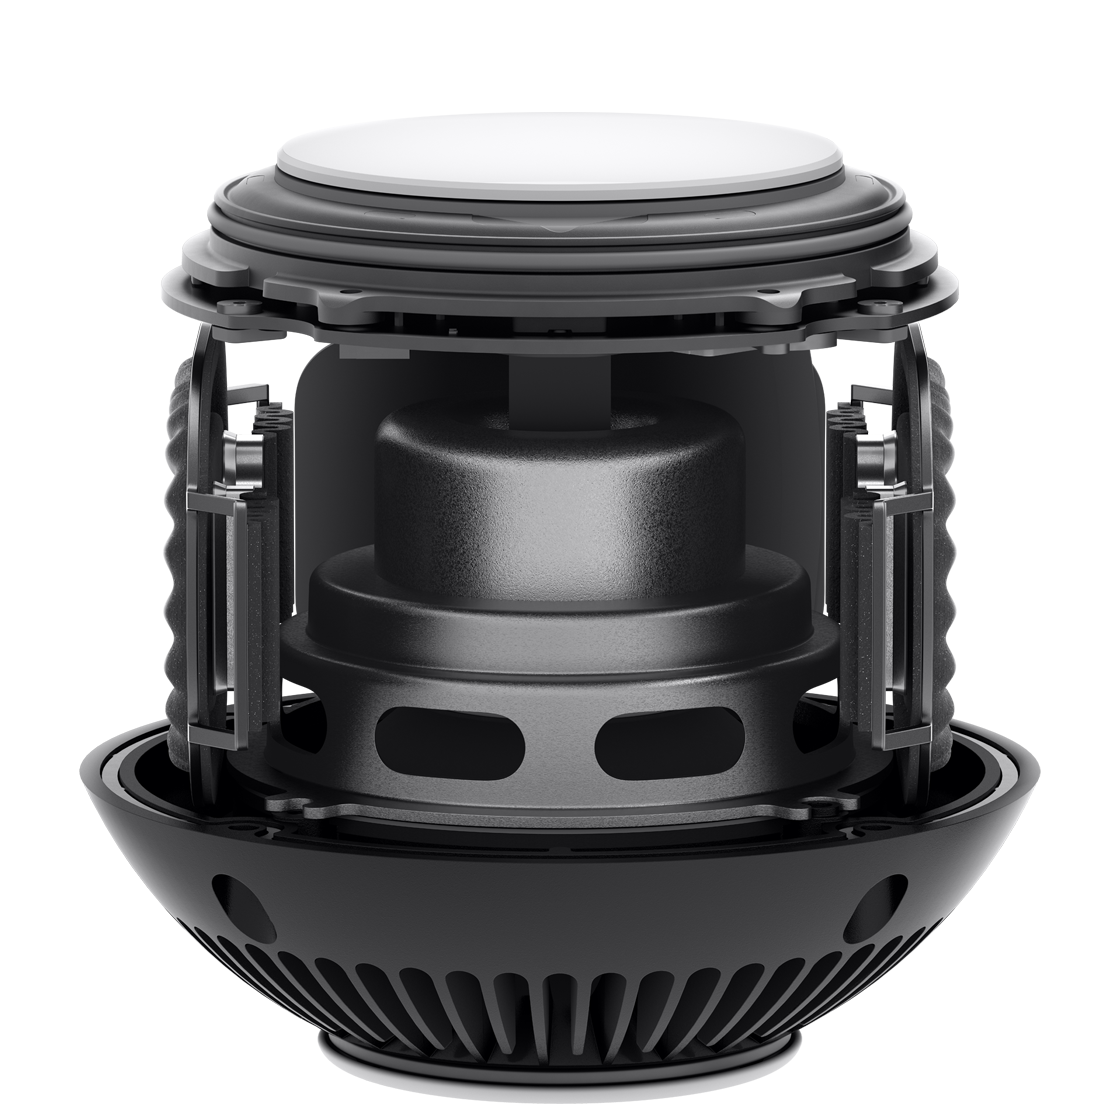 Interior speaker elements of HomePod mini.